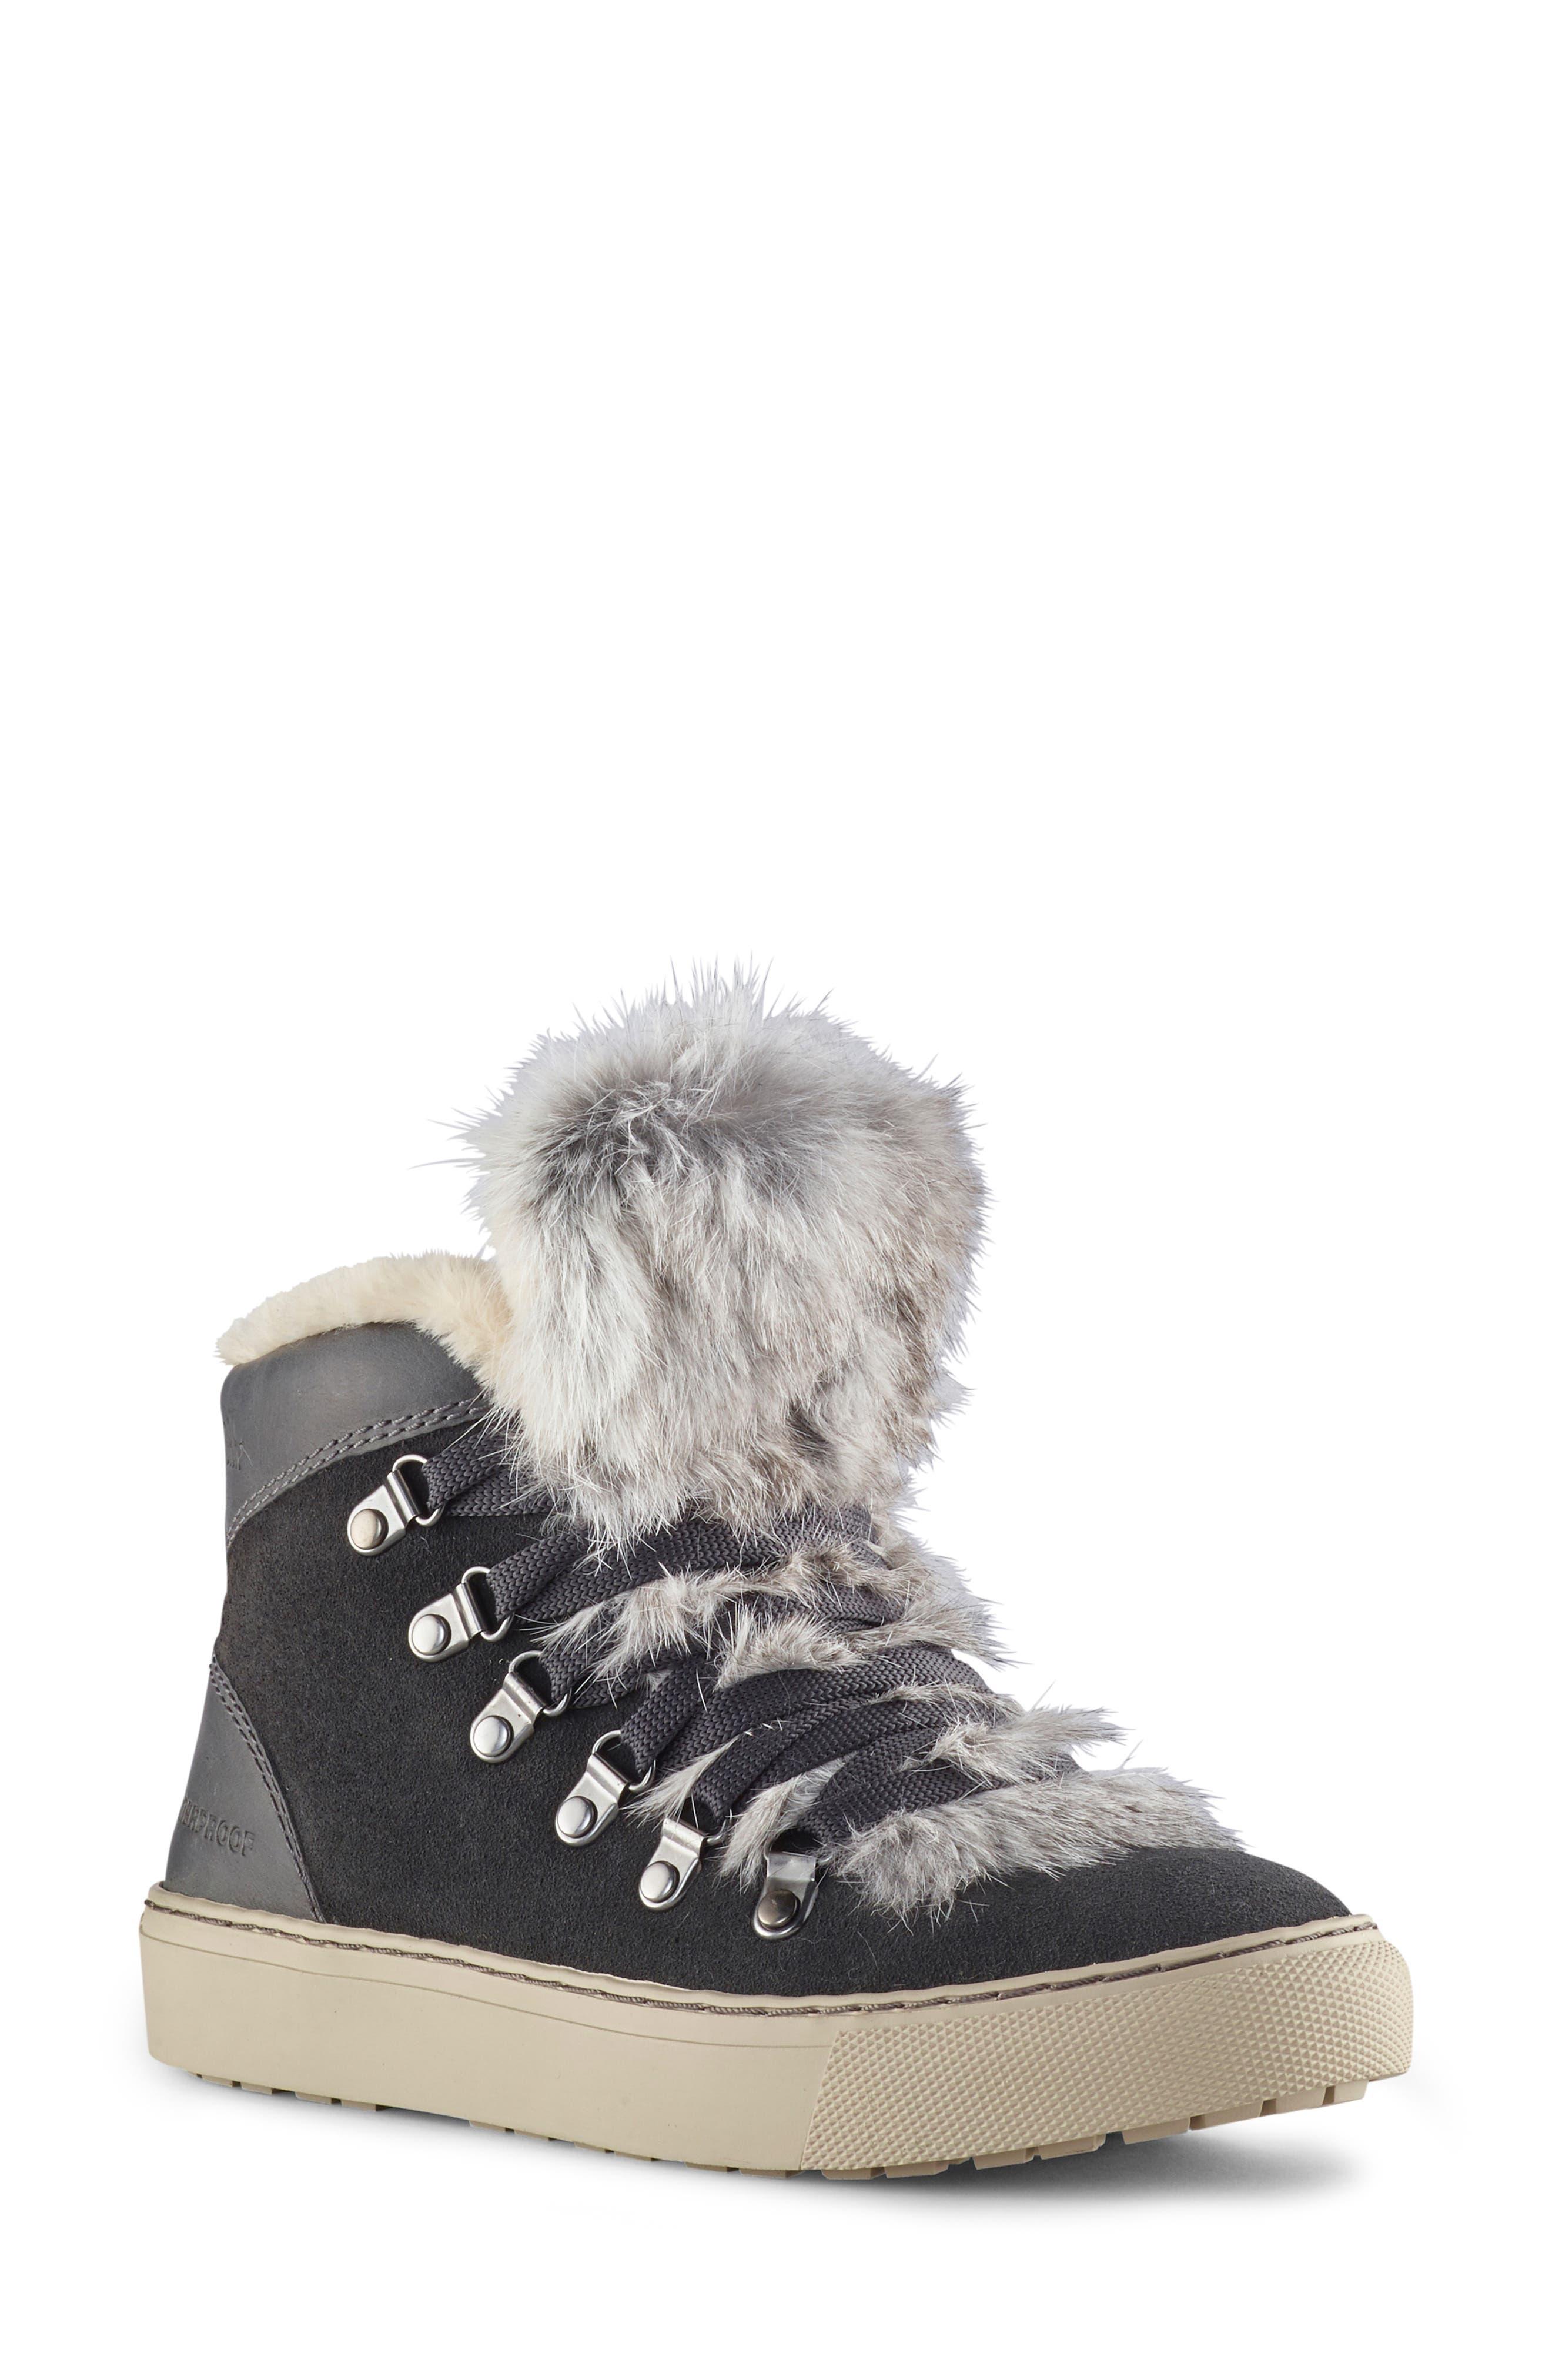 COUGAR Dani High Top Sneaker with Genuine Rabbit Fur Trim, Main, color, PEWTER SUEDE